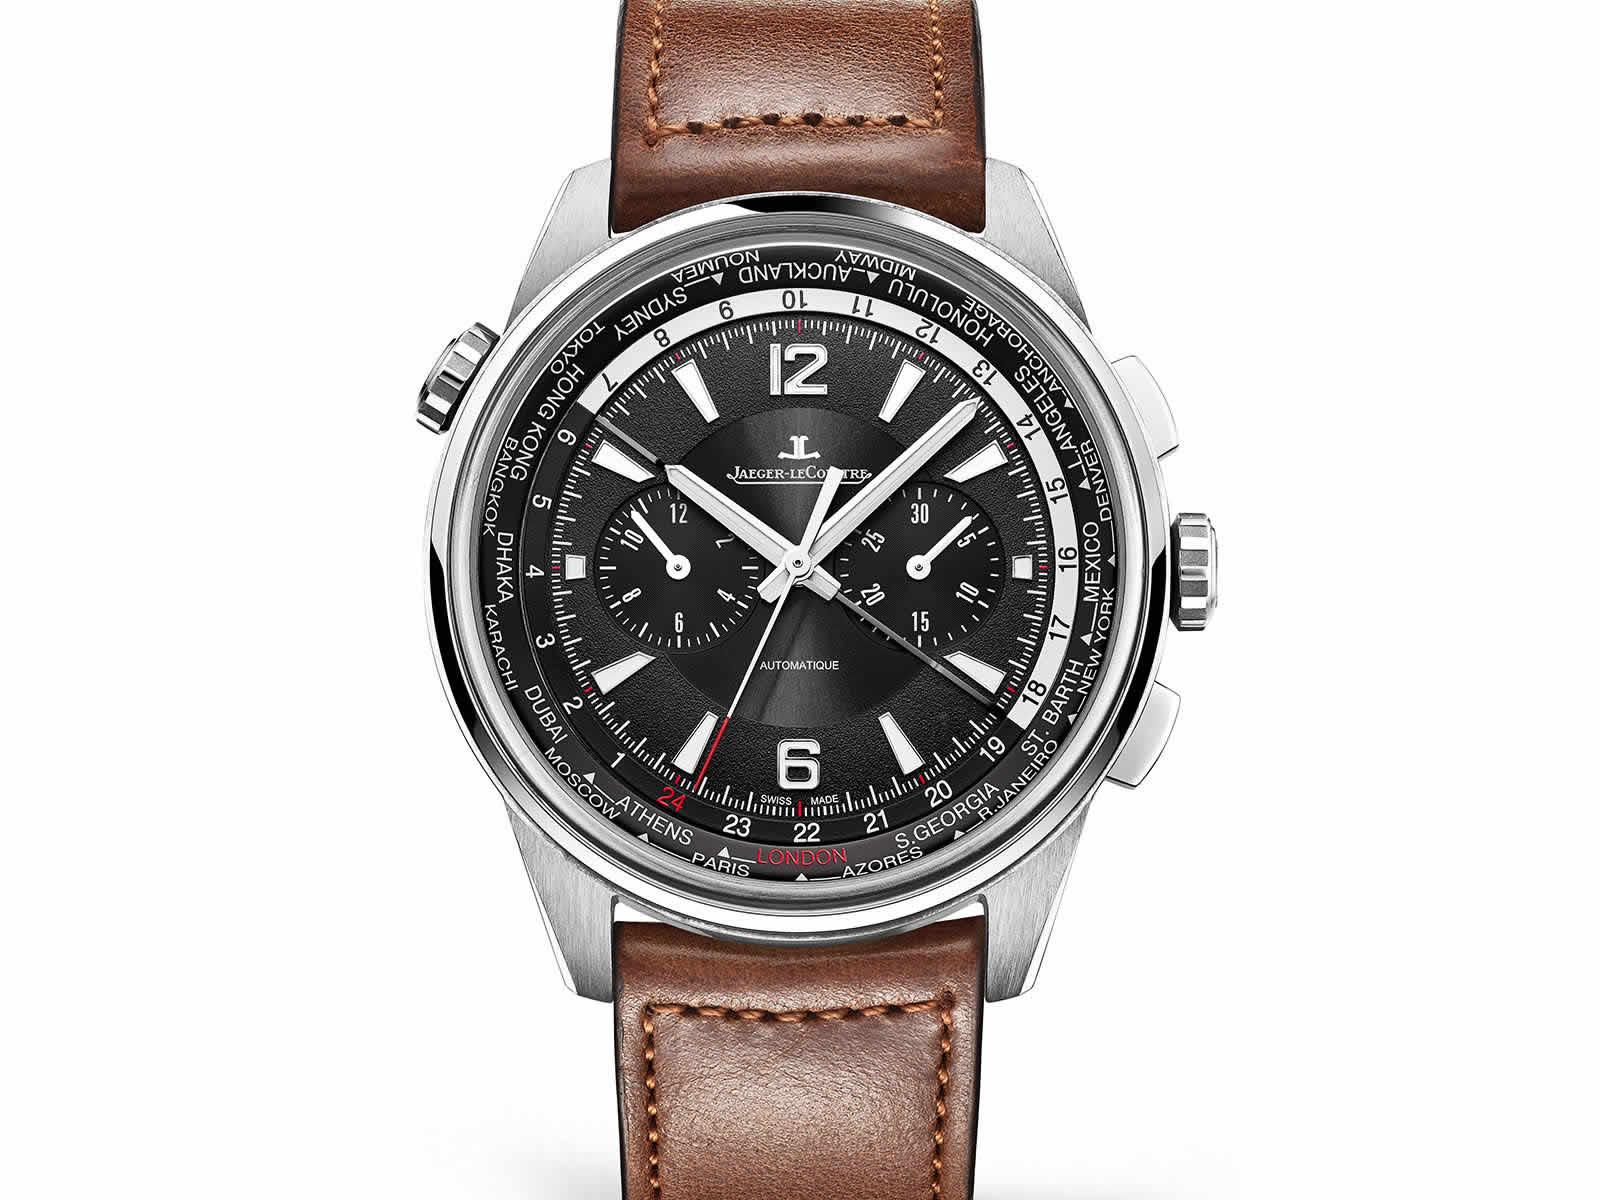 Jaeger-LeCoultre-Polaris-Chronograph-WT-2-O.jpg